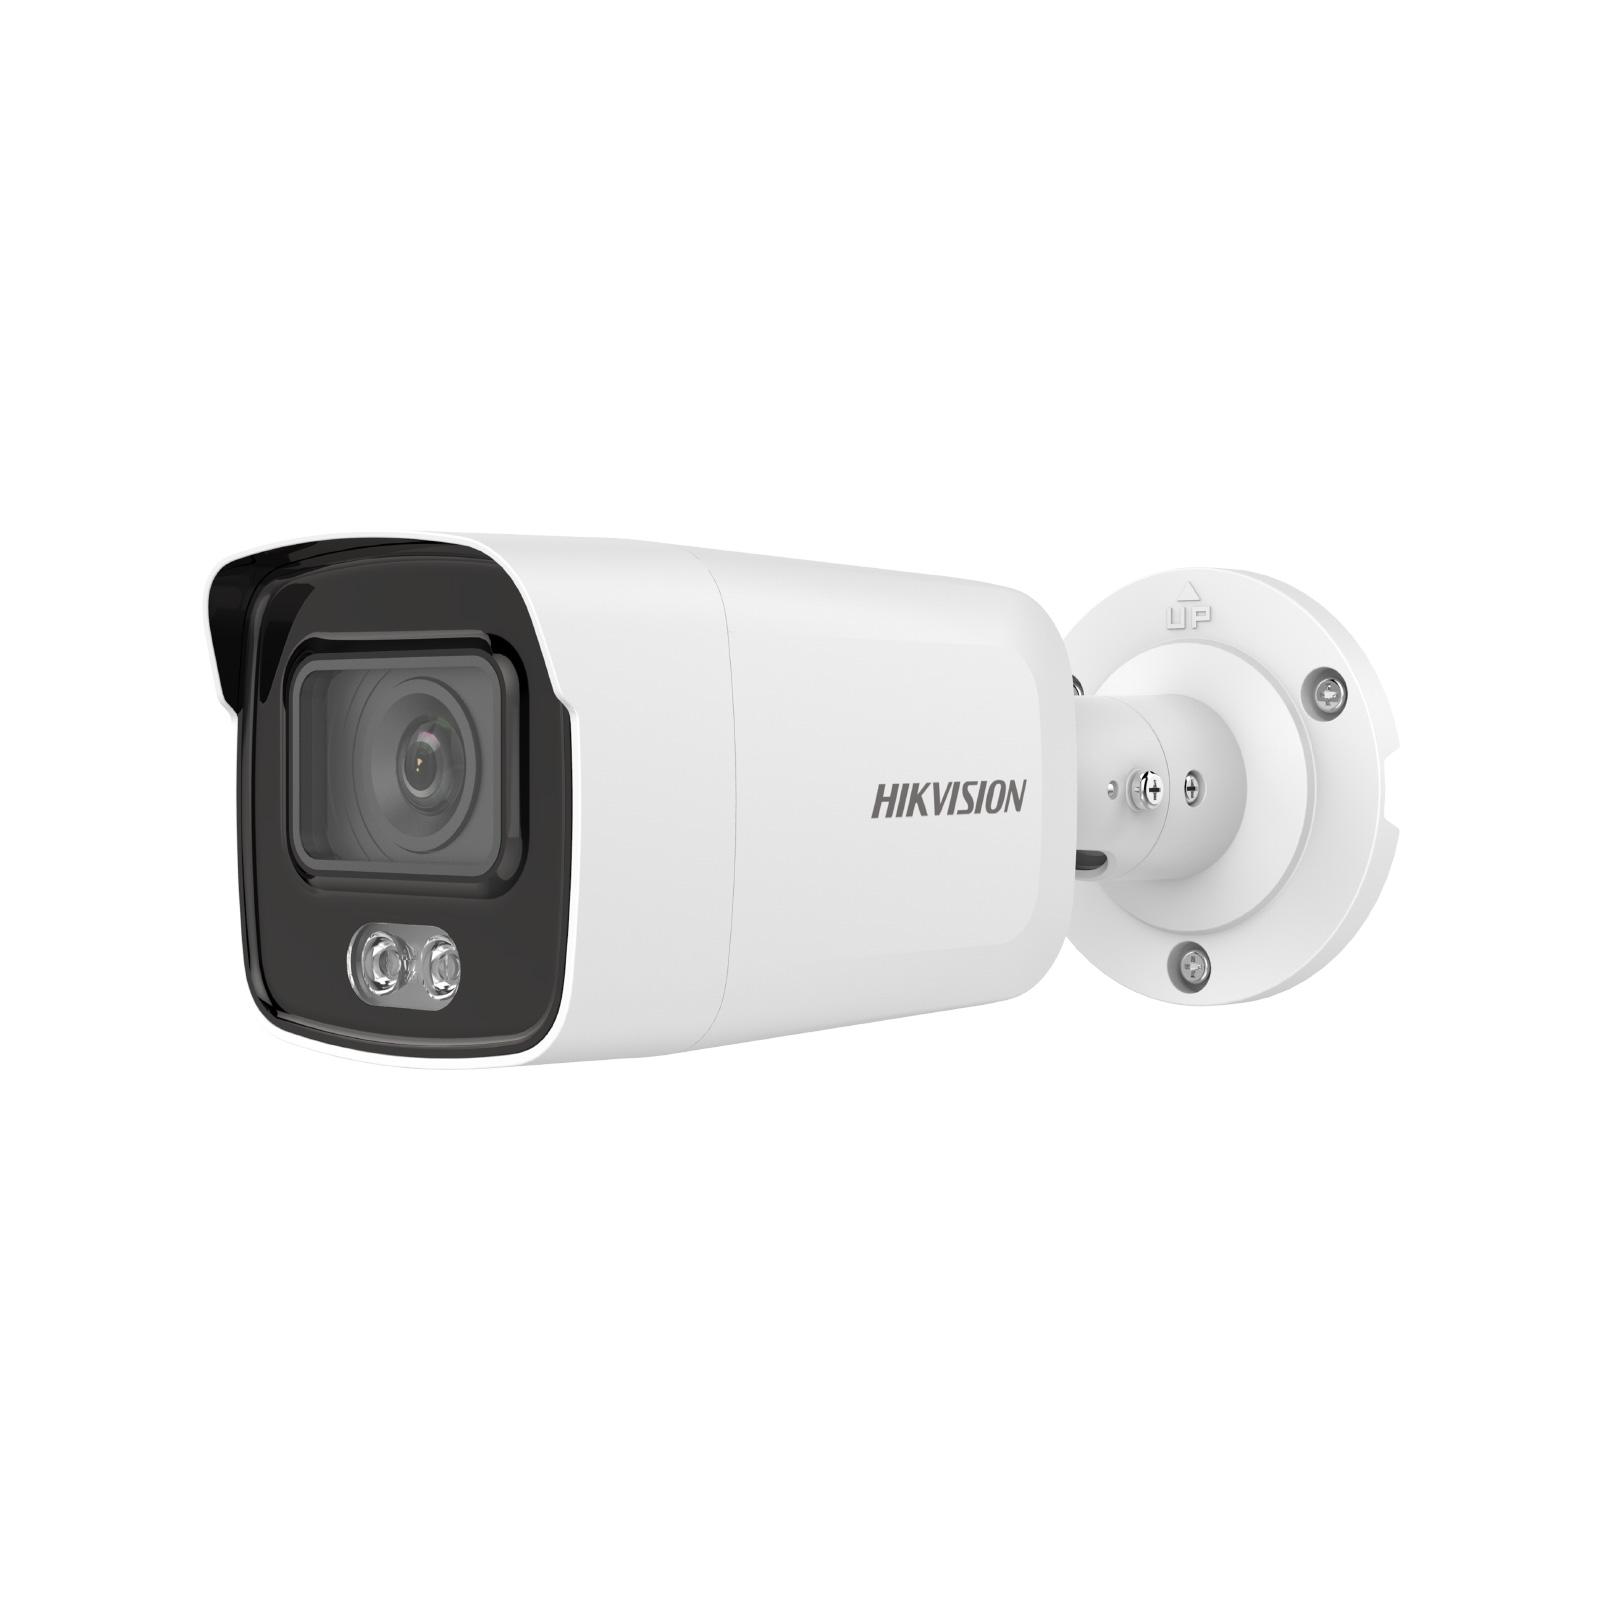 Hikvision-DS-2CD2027G1-L 4MM-Hikvision-DS-2CD2027G1-L 4MM-DS-2CD2027G1-L 4MM-Video Surveillance | Laptop Mechanic